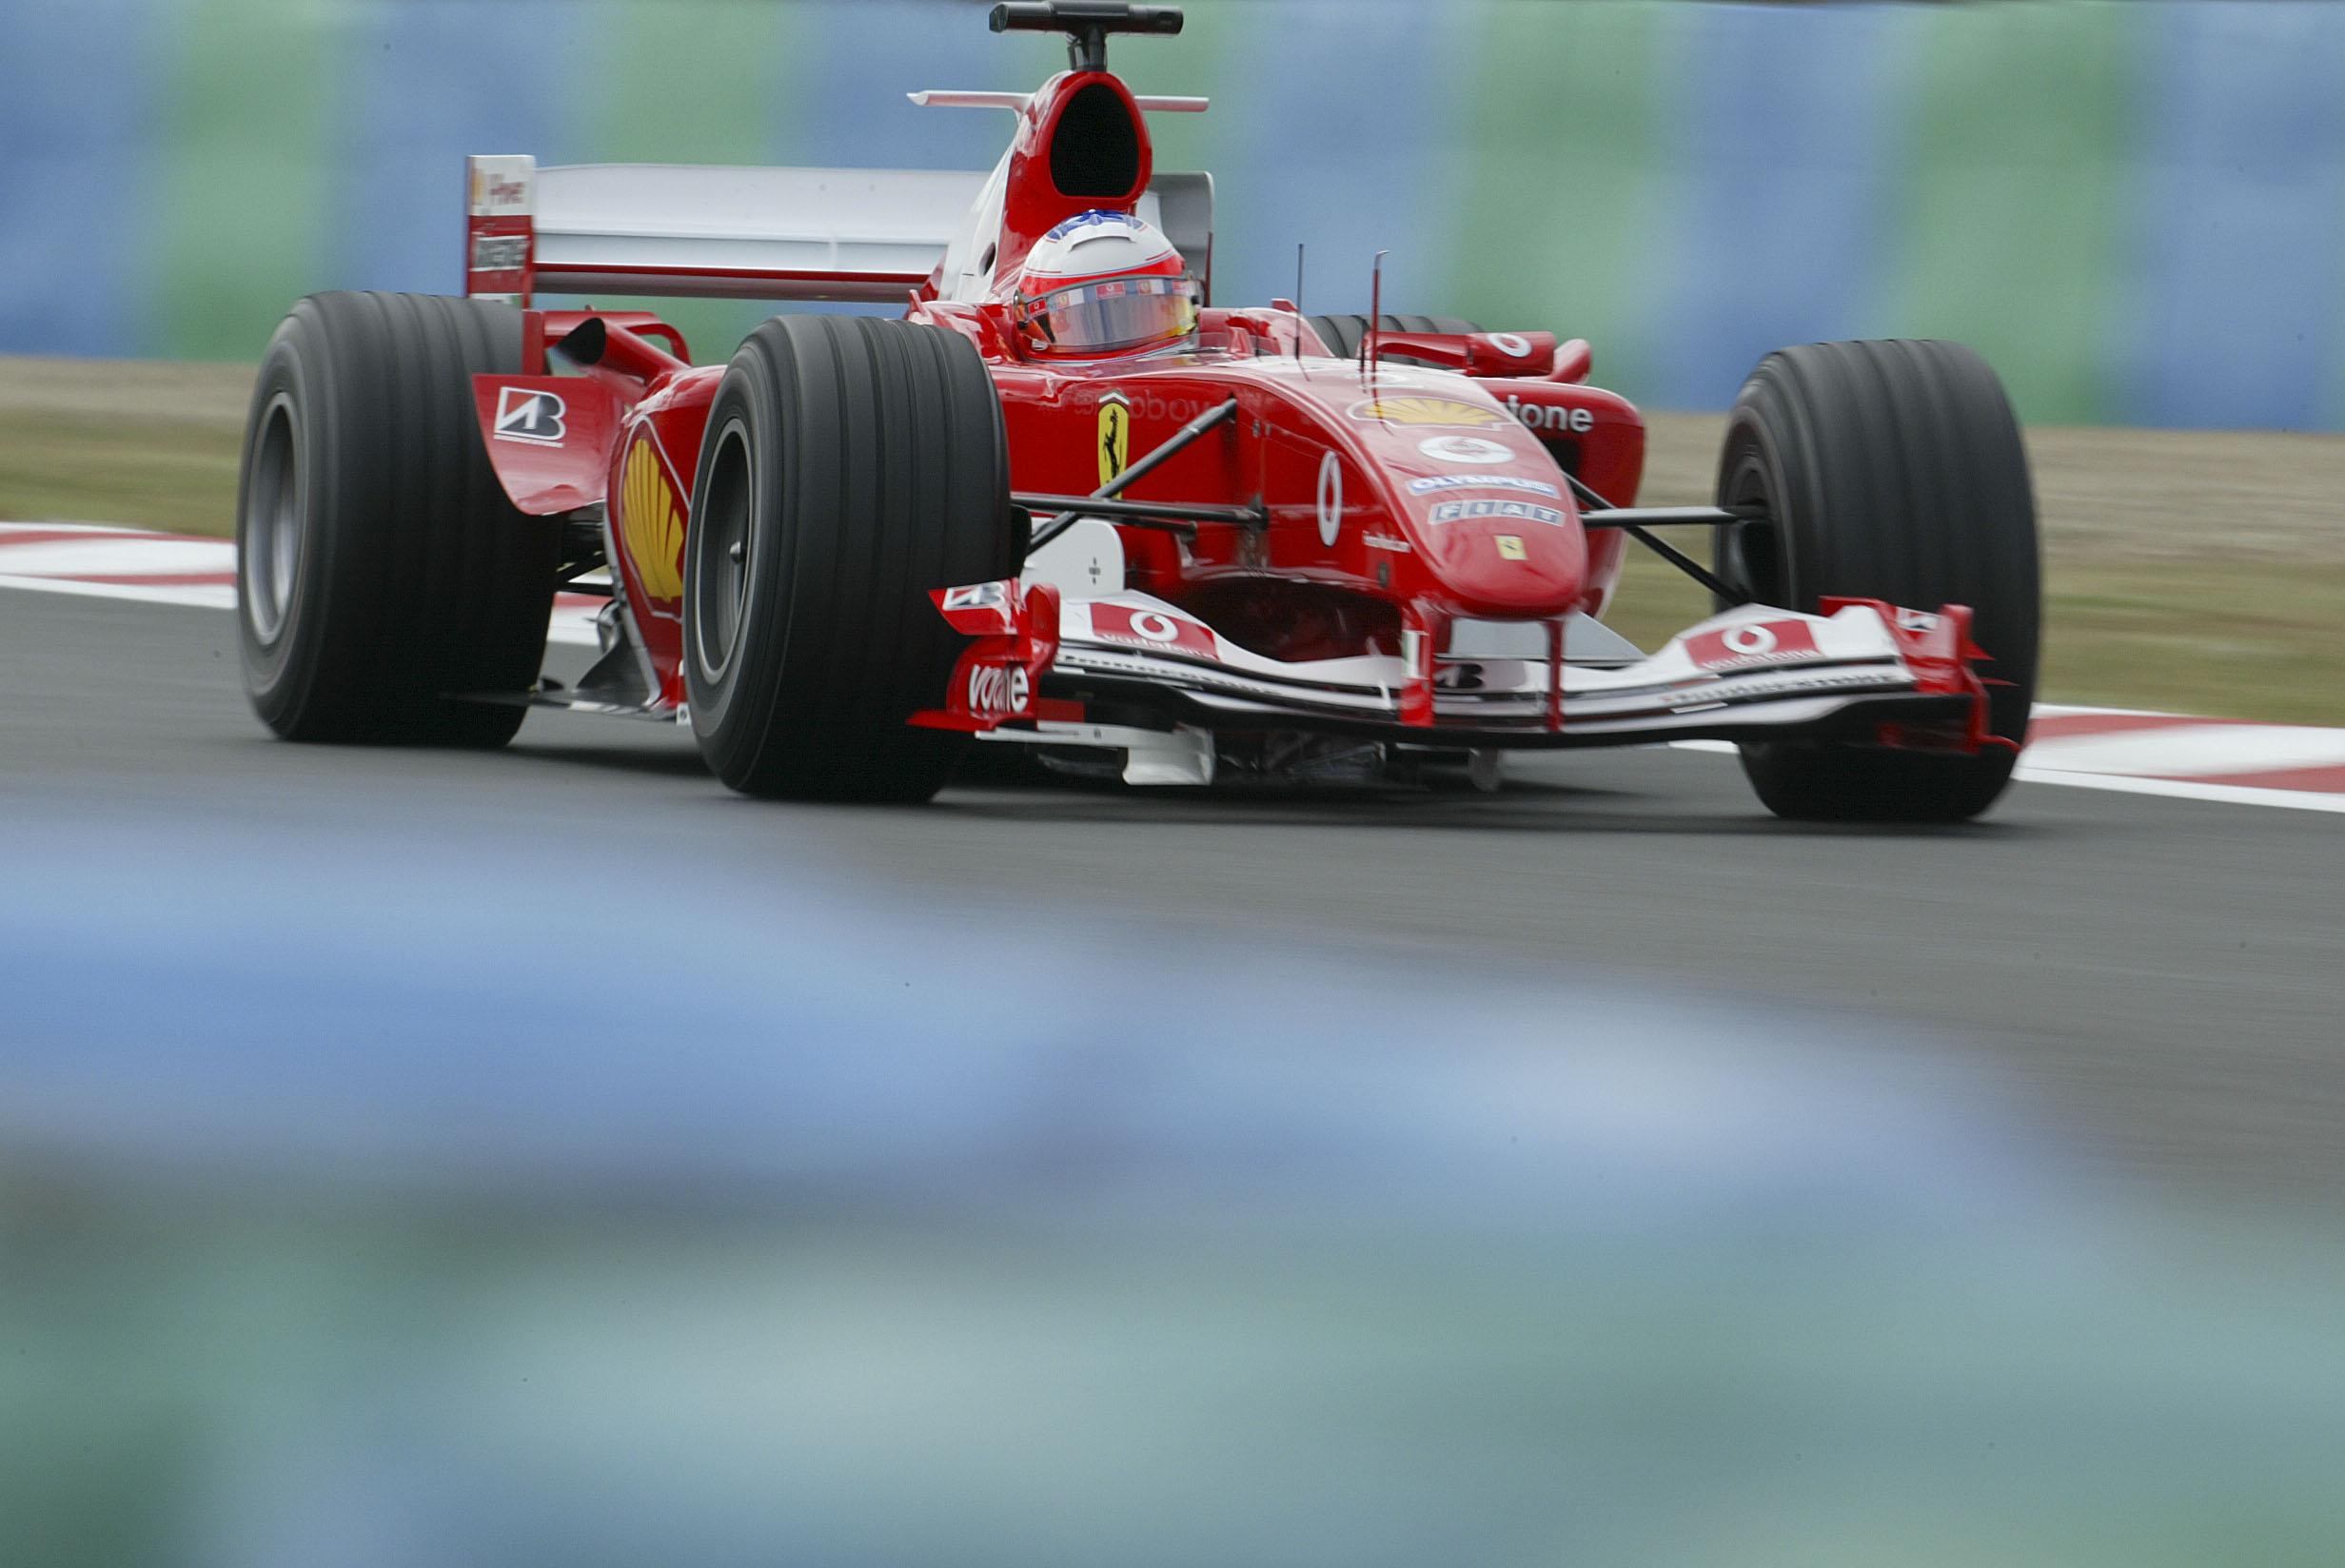 4 soste ma vince lo stesso:  Magny-Cours, 2004, Schumacher